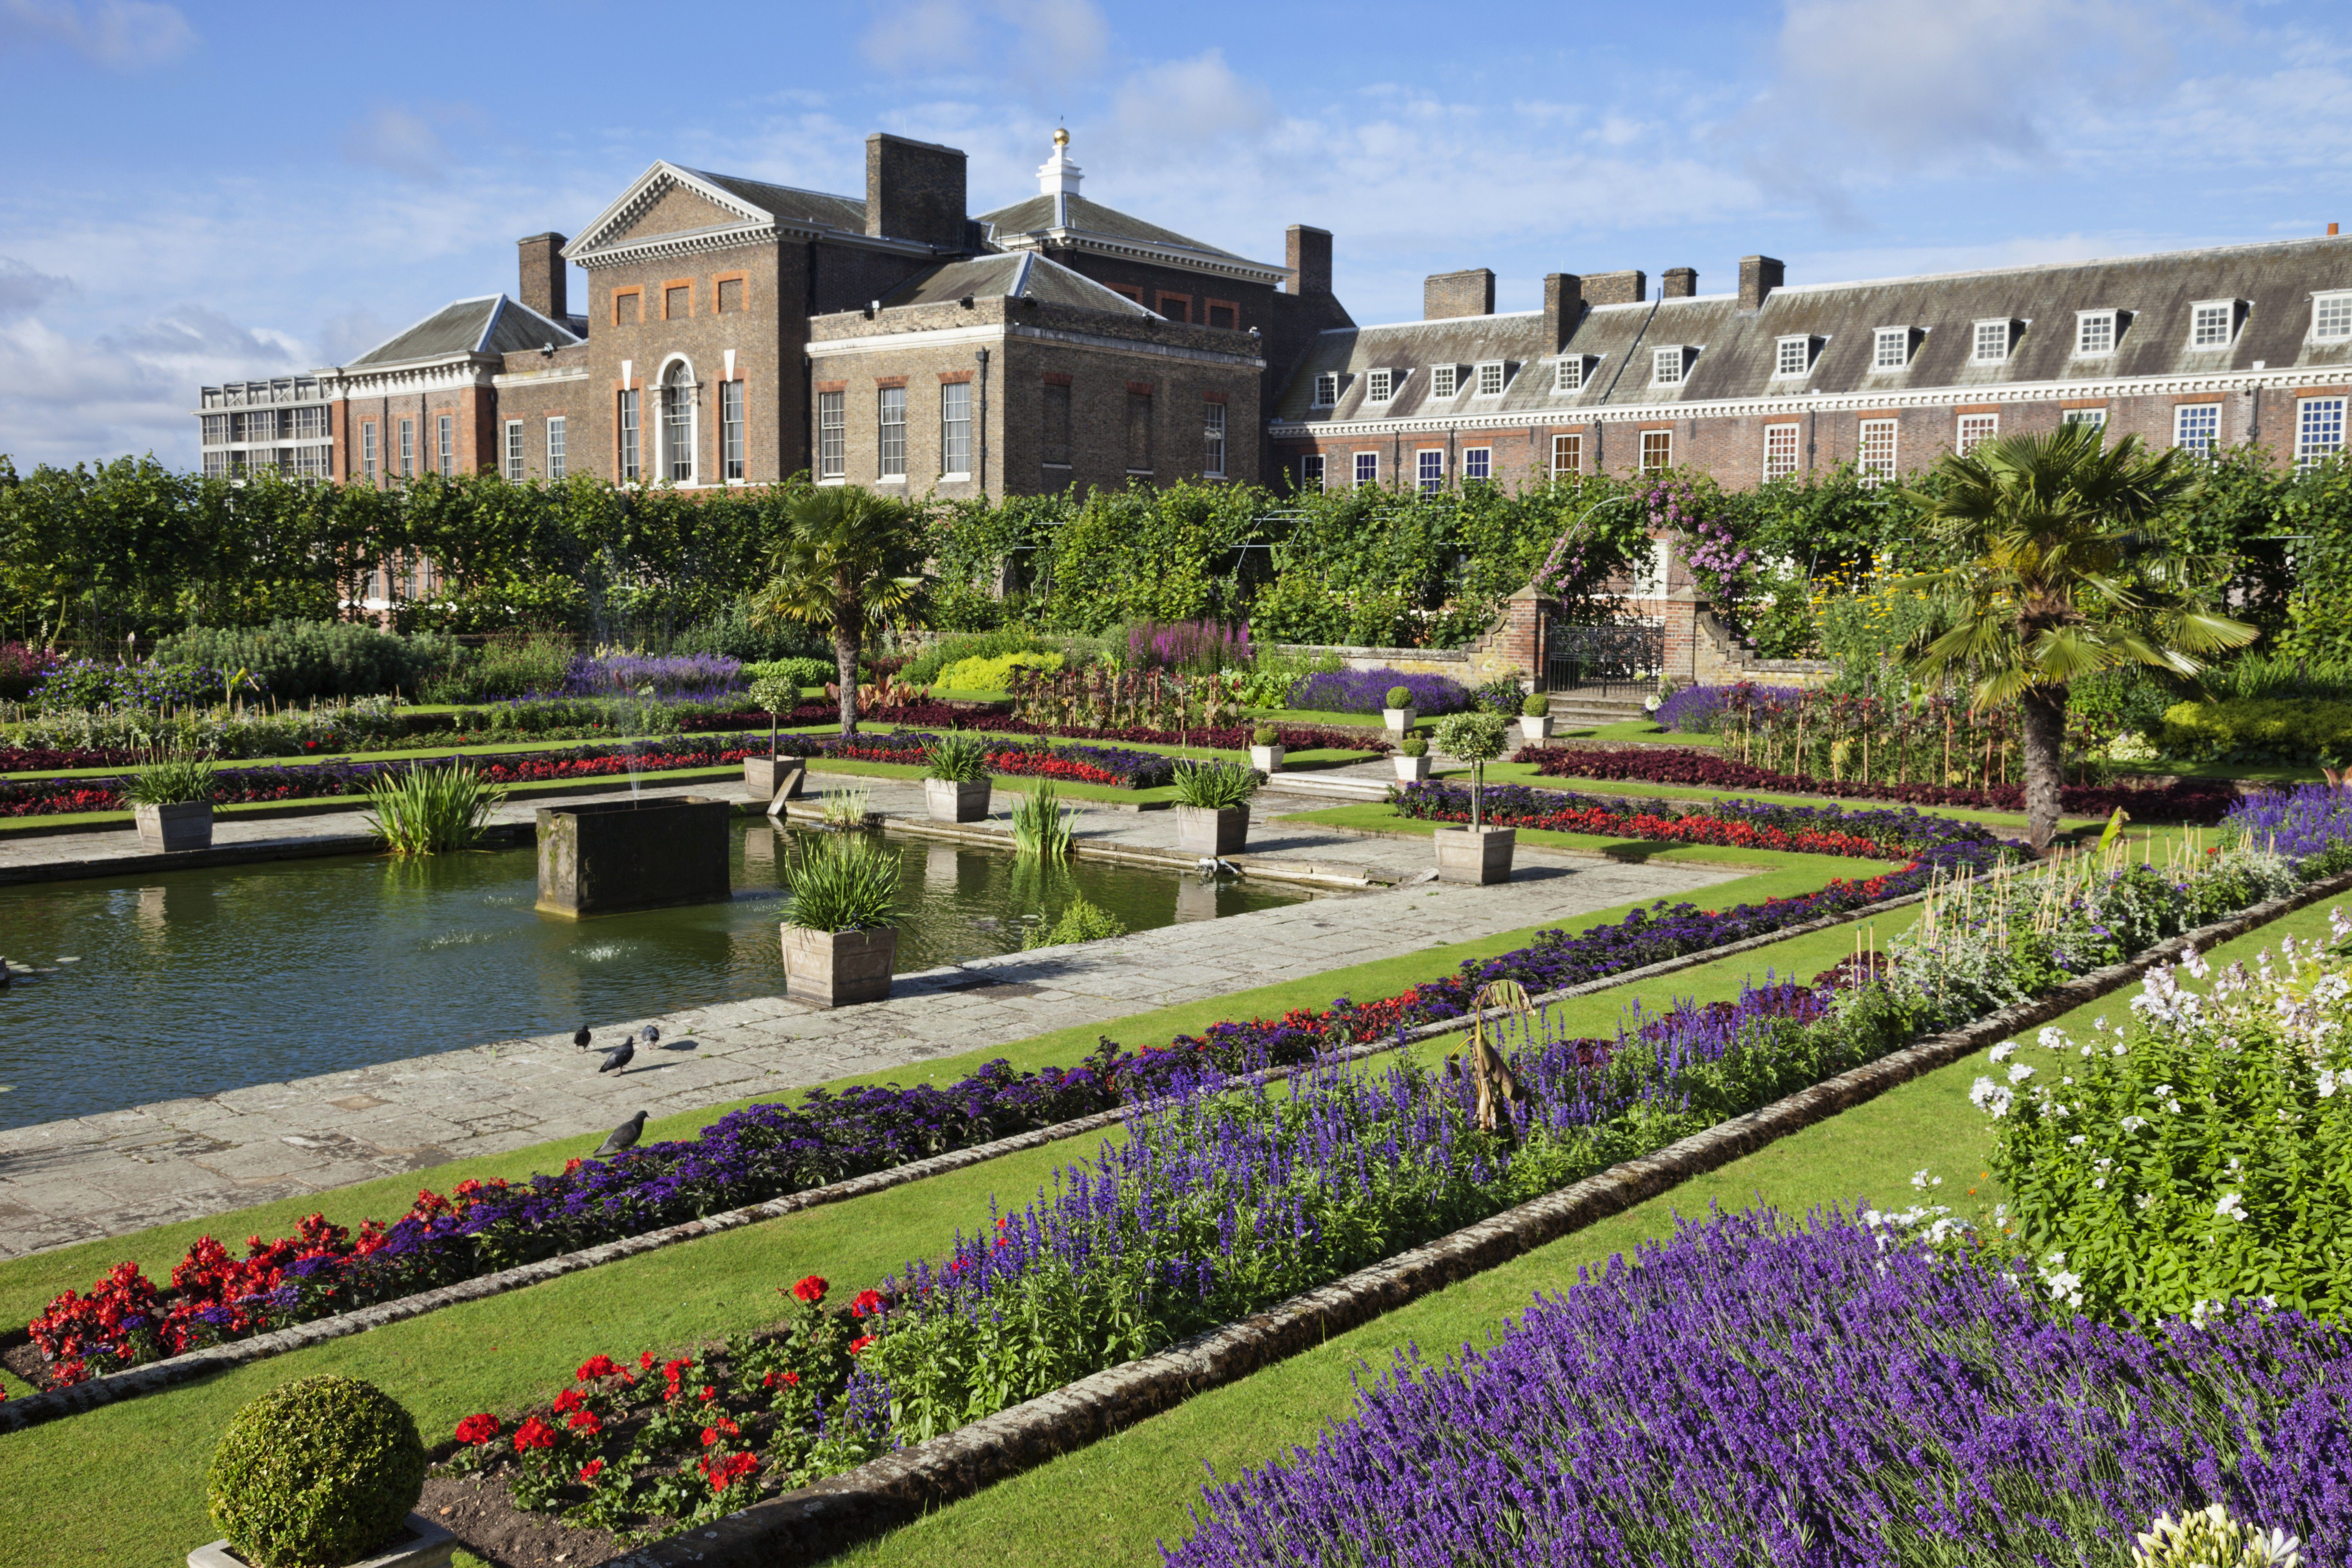 England,London,Kensington,Kensington Gardens,Kensington Palace,The Sunken Garden